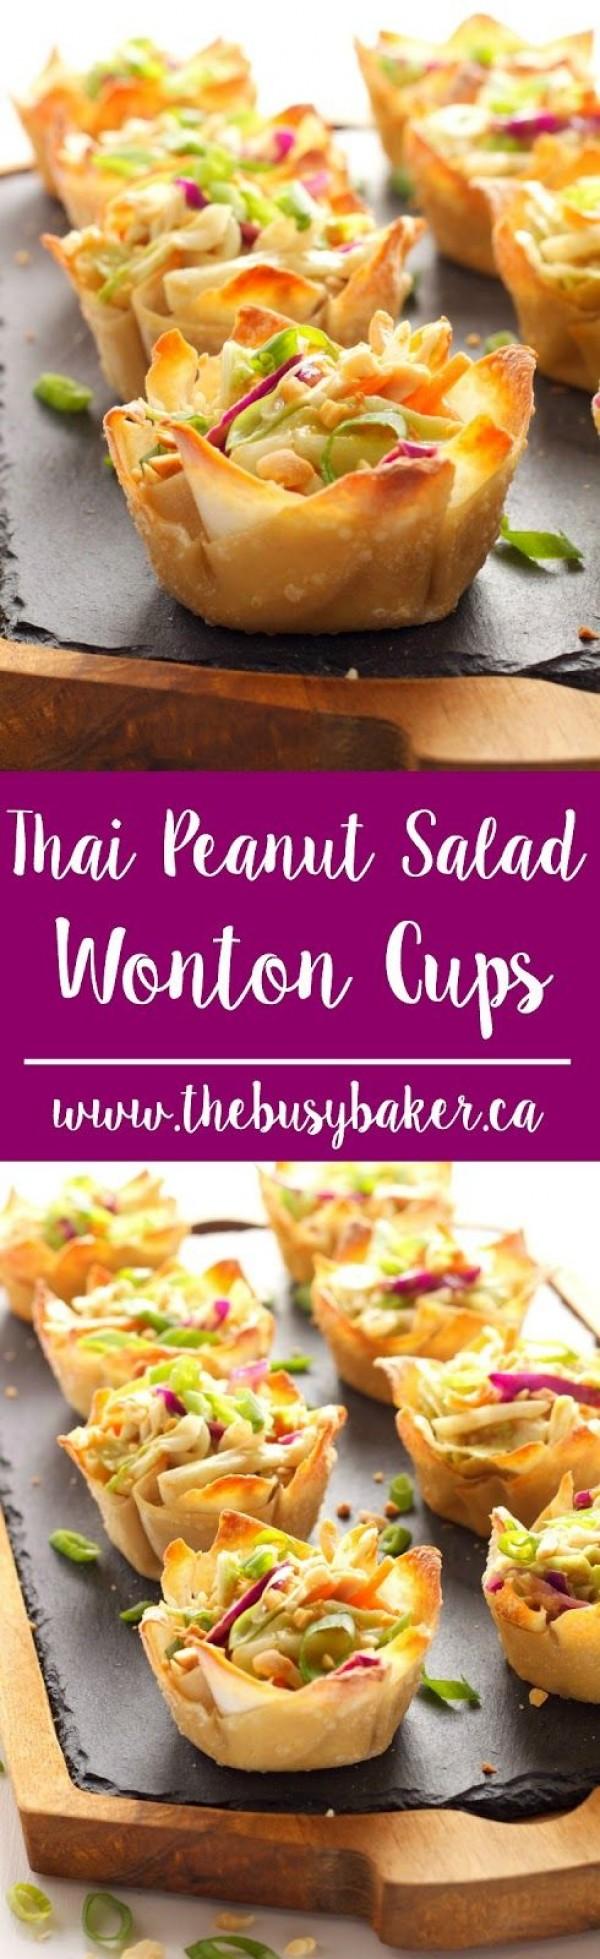 Get the recipe Thai Peanut Salad Won-ton Cups @recipes_to_go